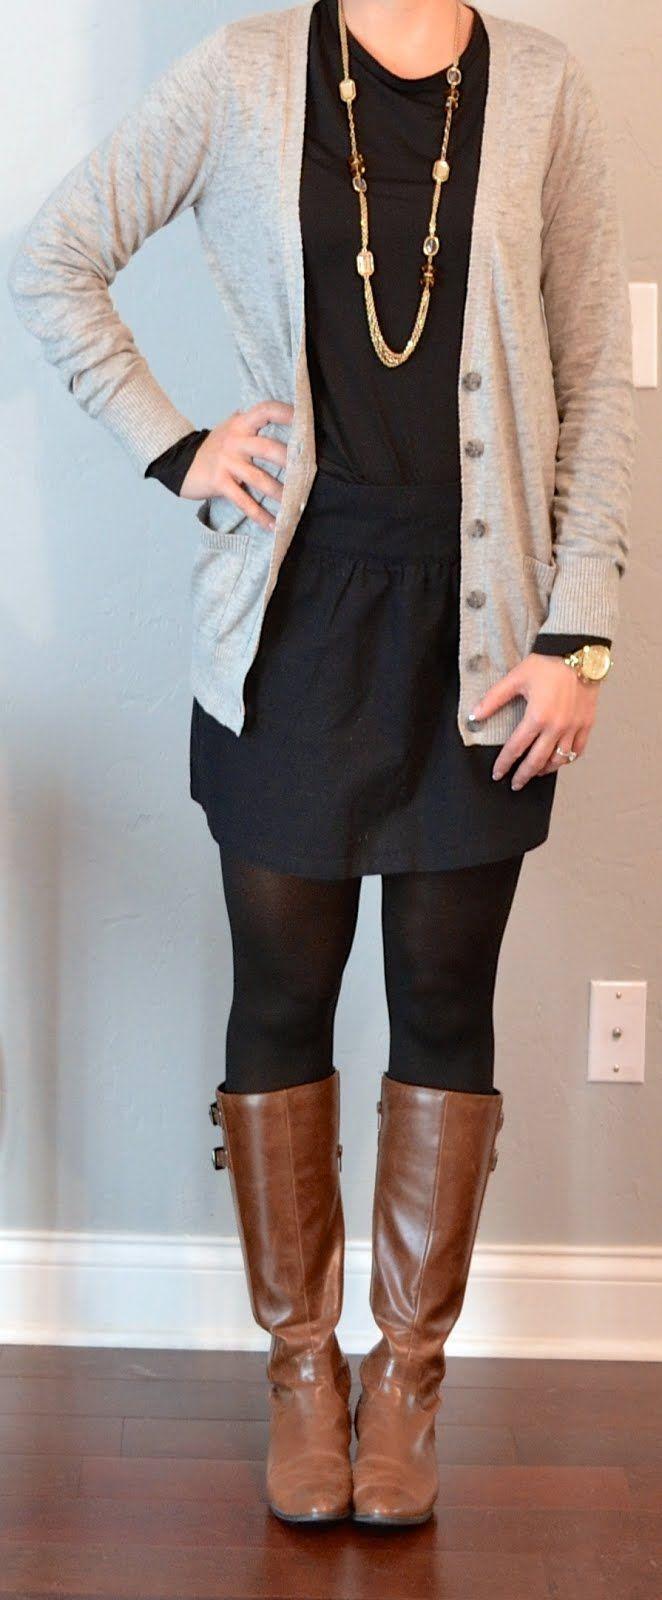 black dress….brown boots….tan sweater